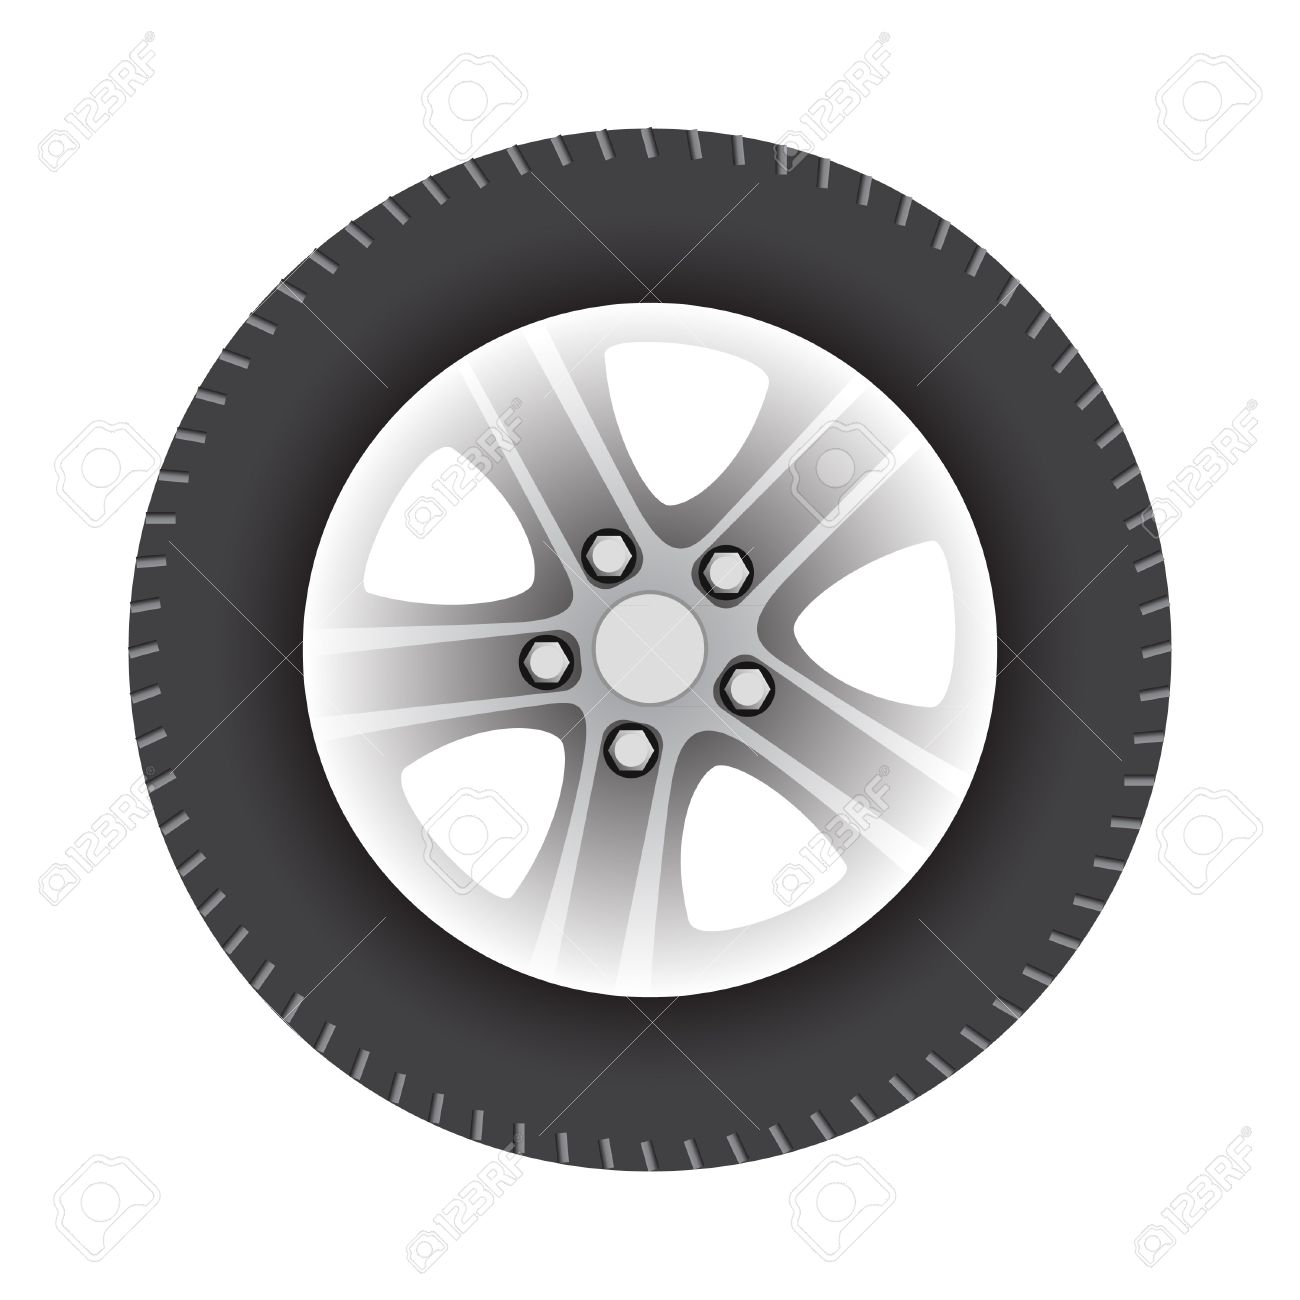 car wheel vector illustration isolated on white background - 10441147